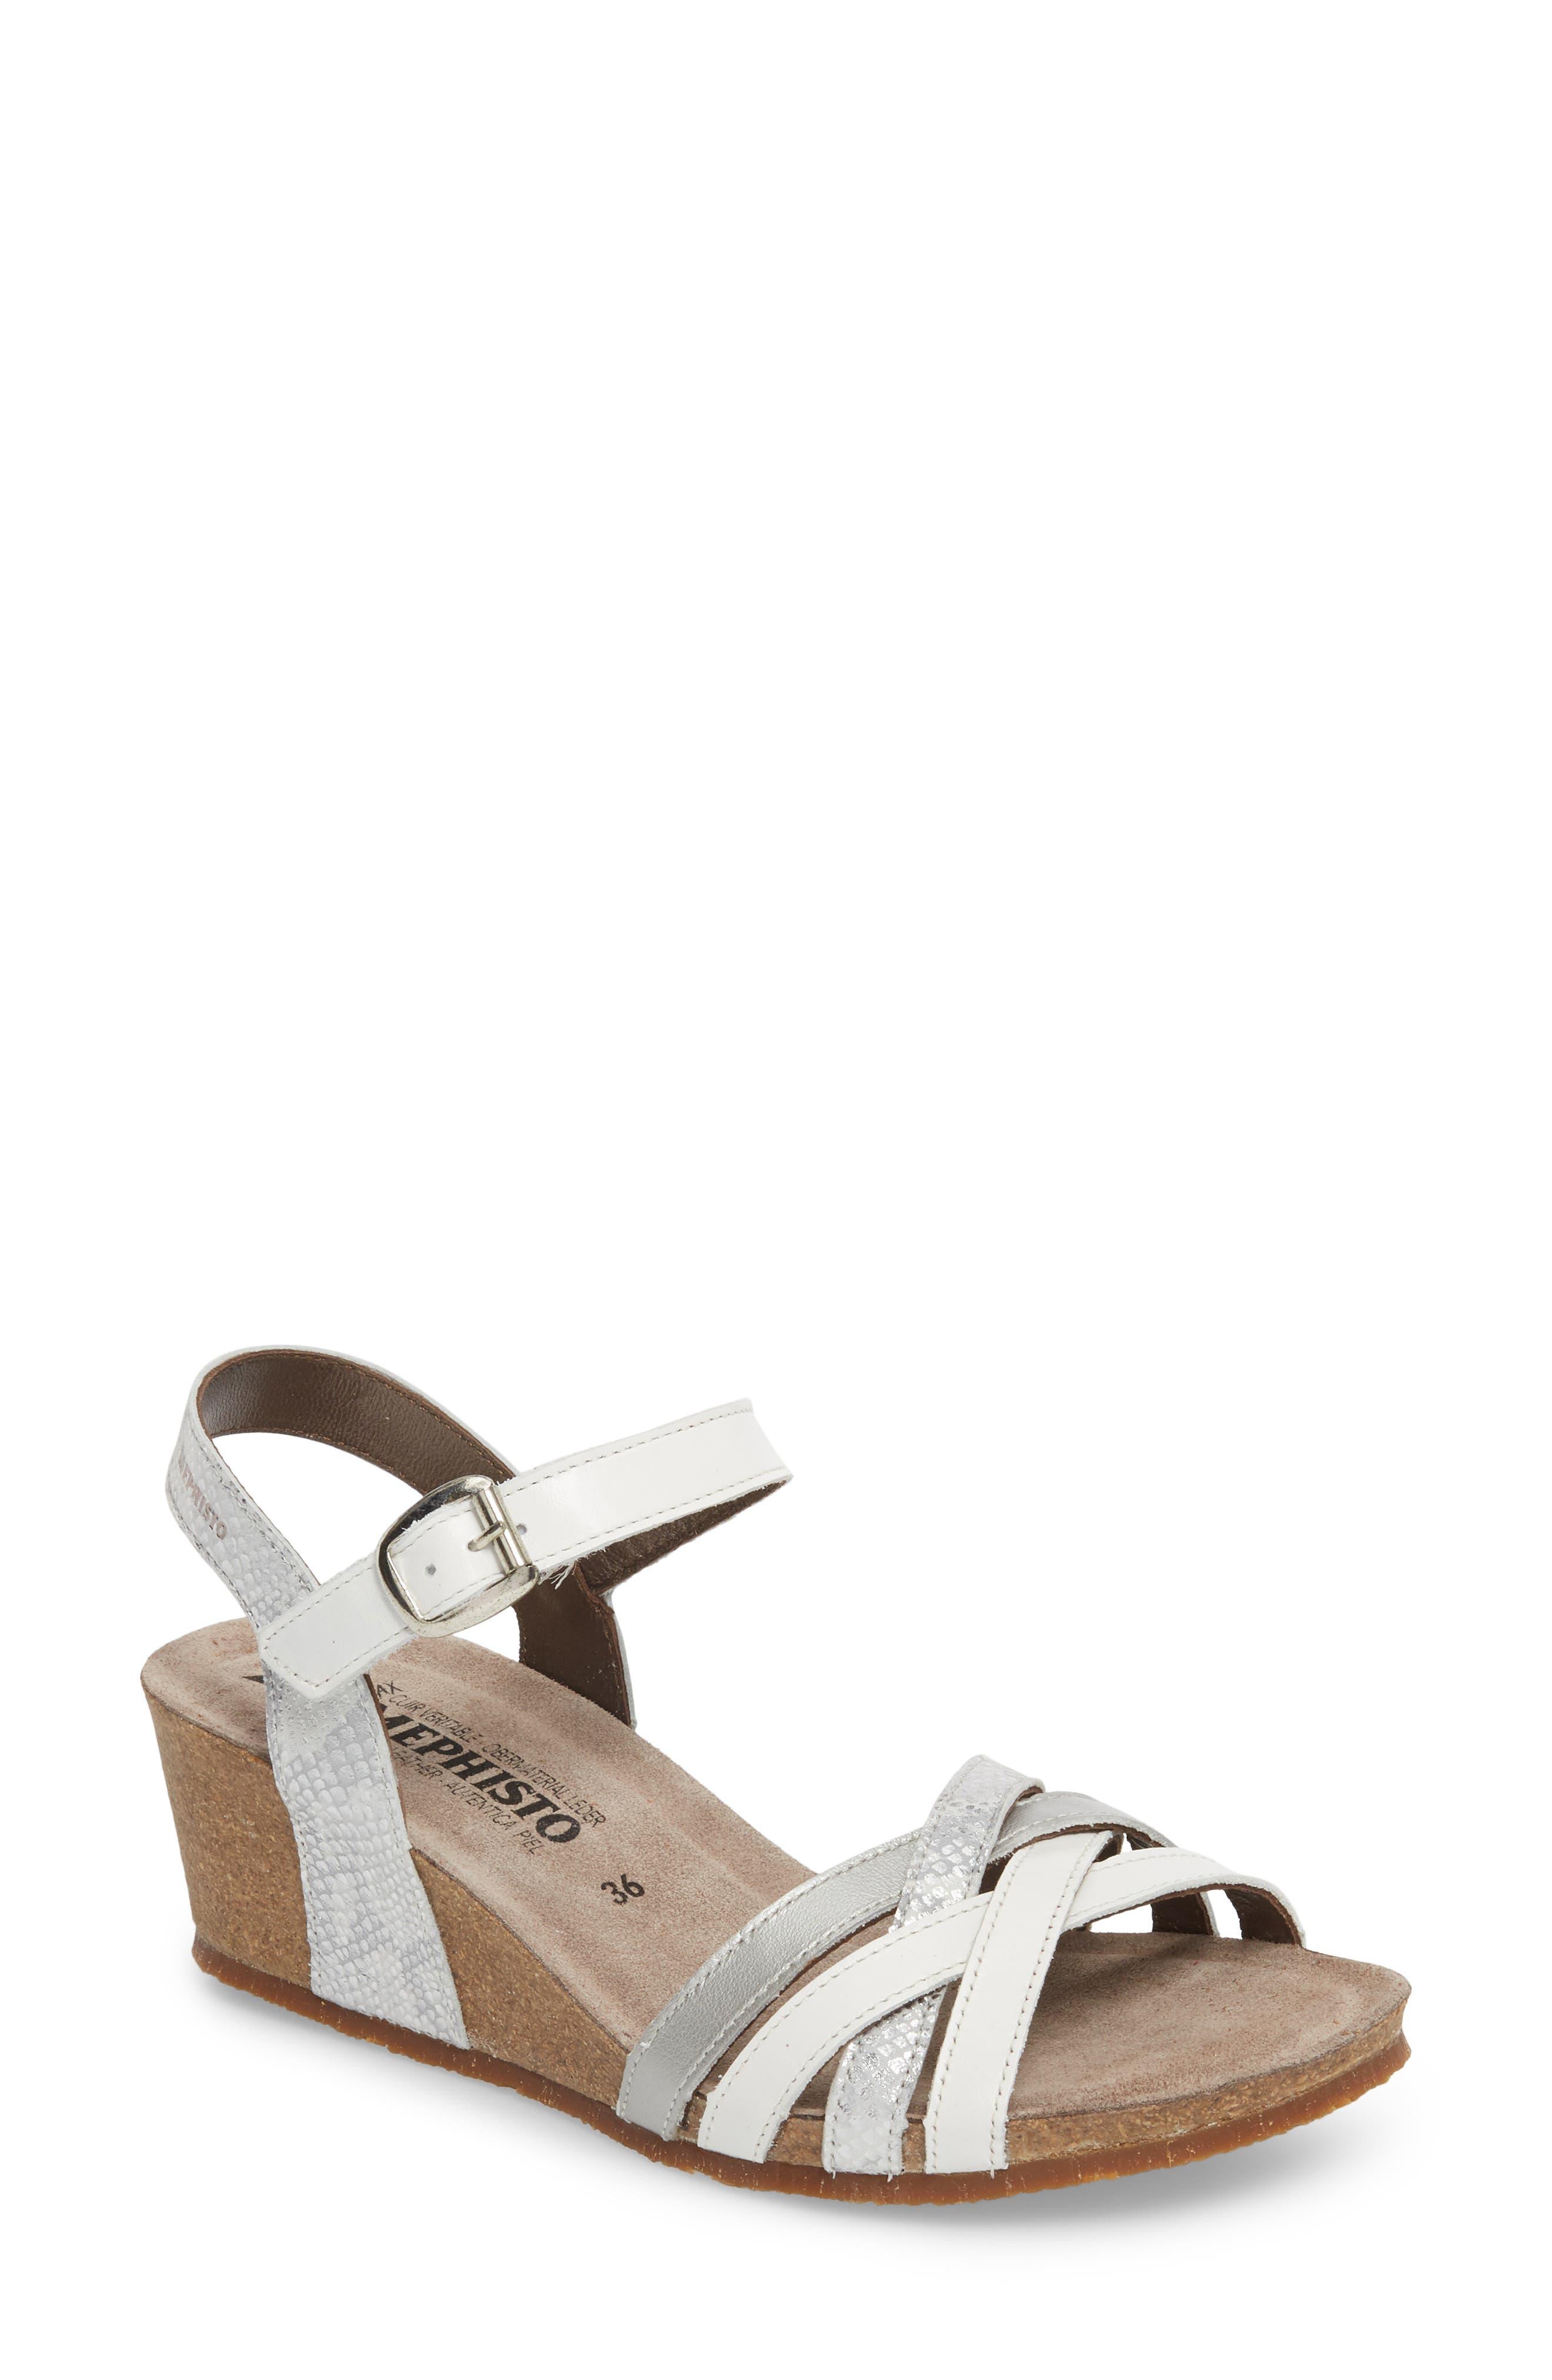 Mado Wedge Sandal,                             Main thumbnail 1, color,                             White Leather